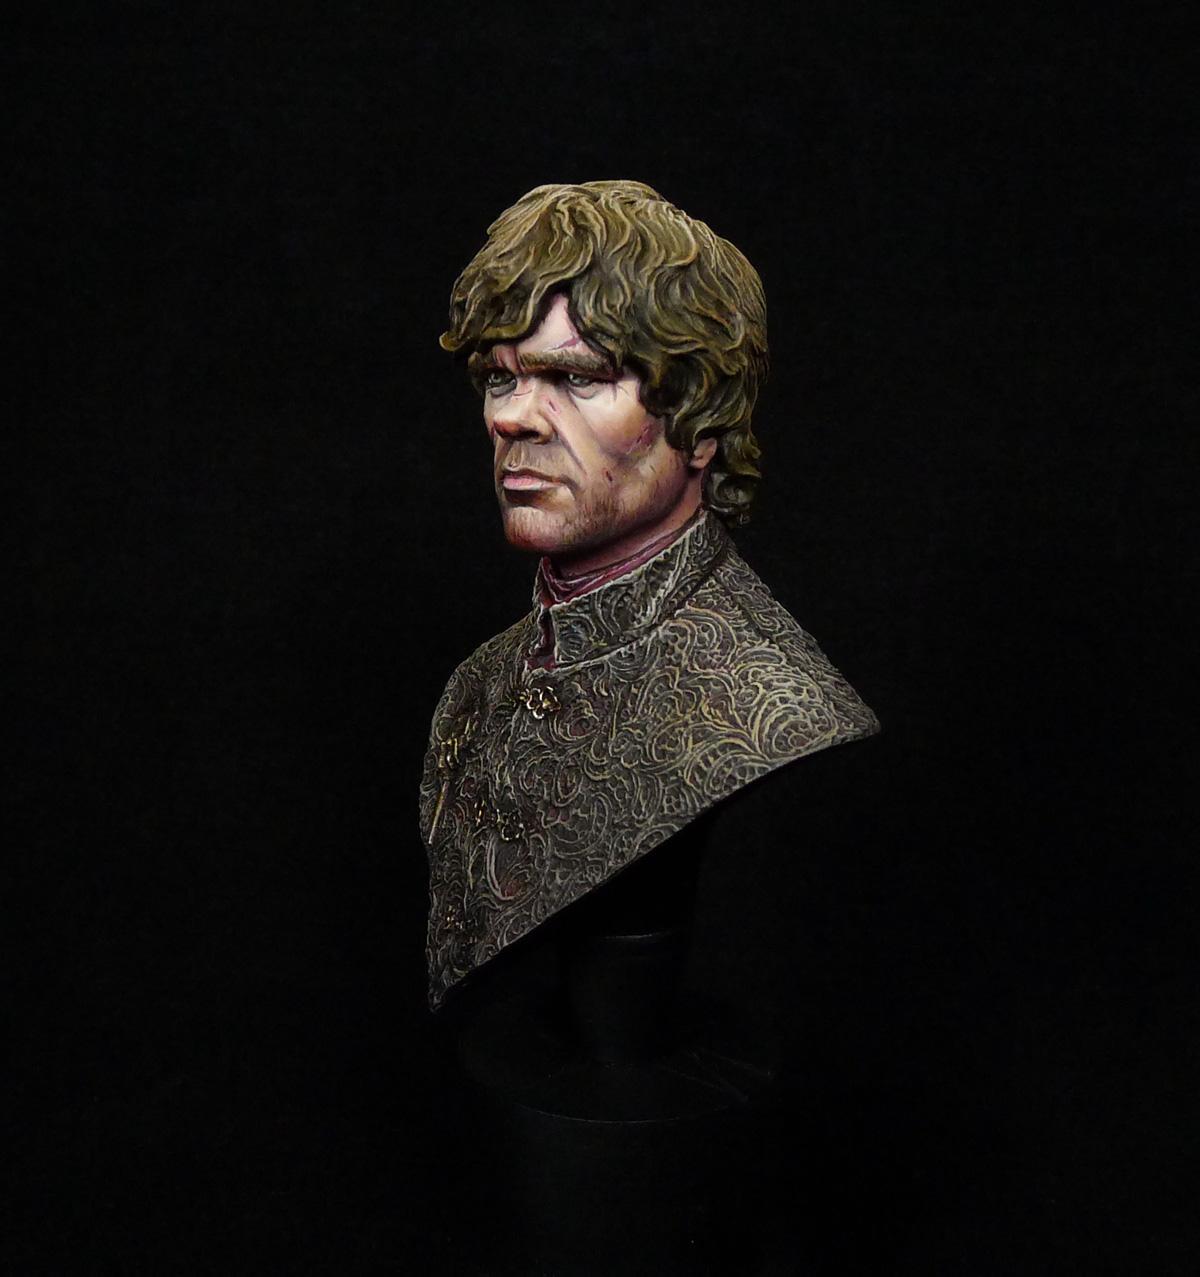 Tirion Lannister